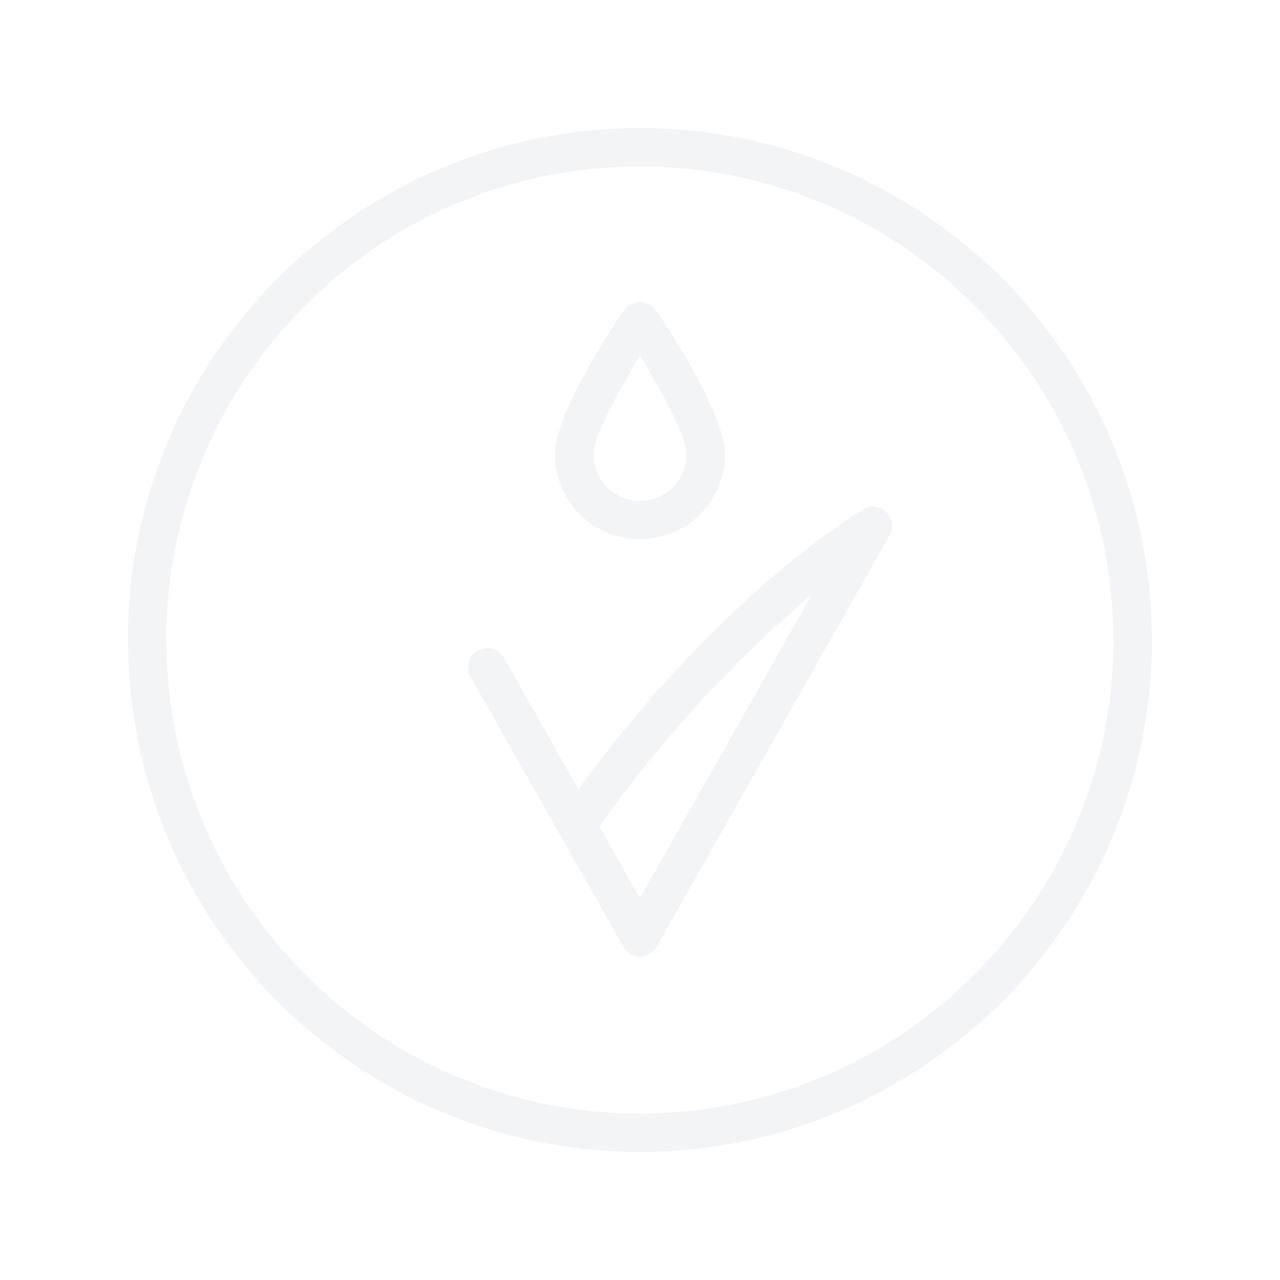 GIORGIO ARMANI Si 100ml Eau De Parfum Gift Set подарочный набор